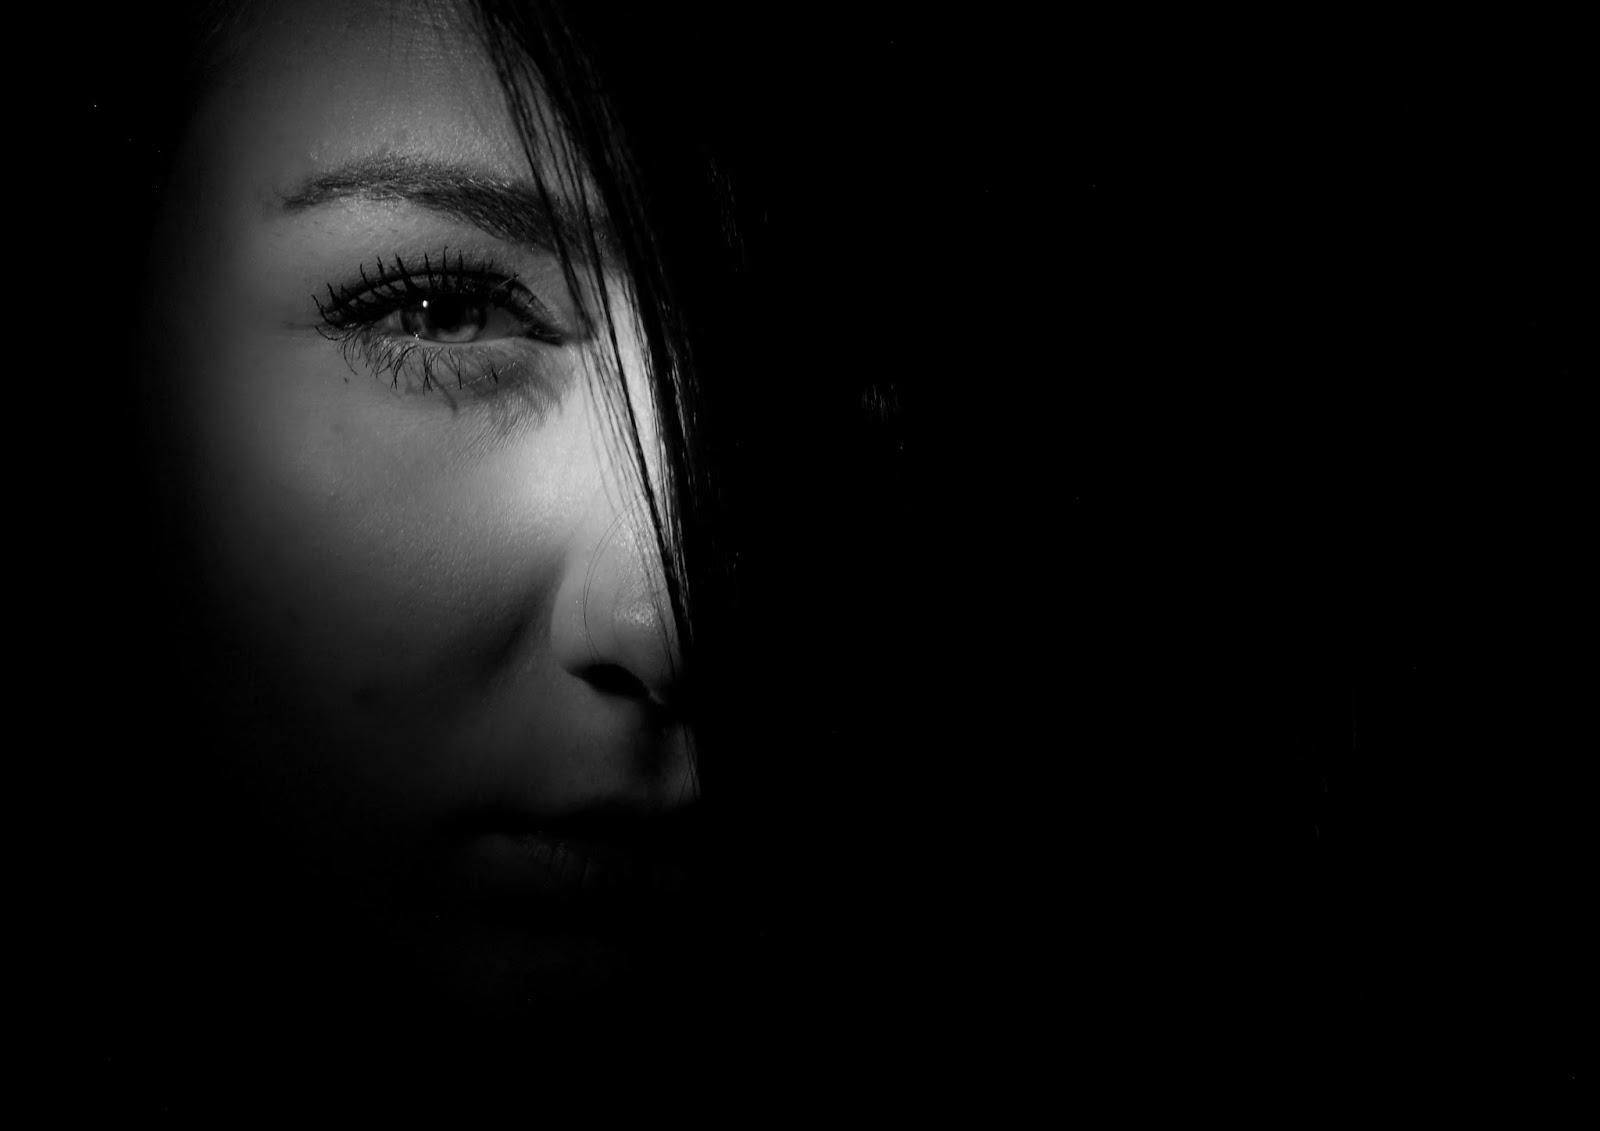 Eye Shading Head Girl - pixabay.com